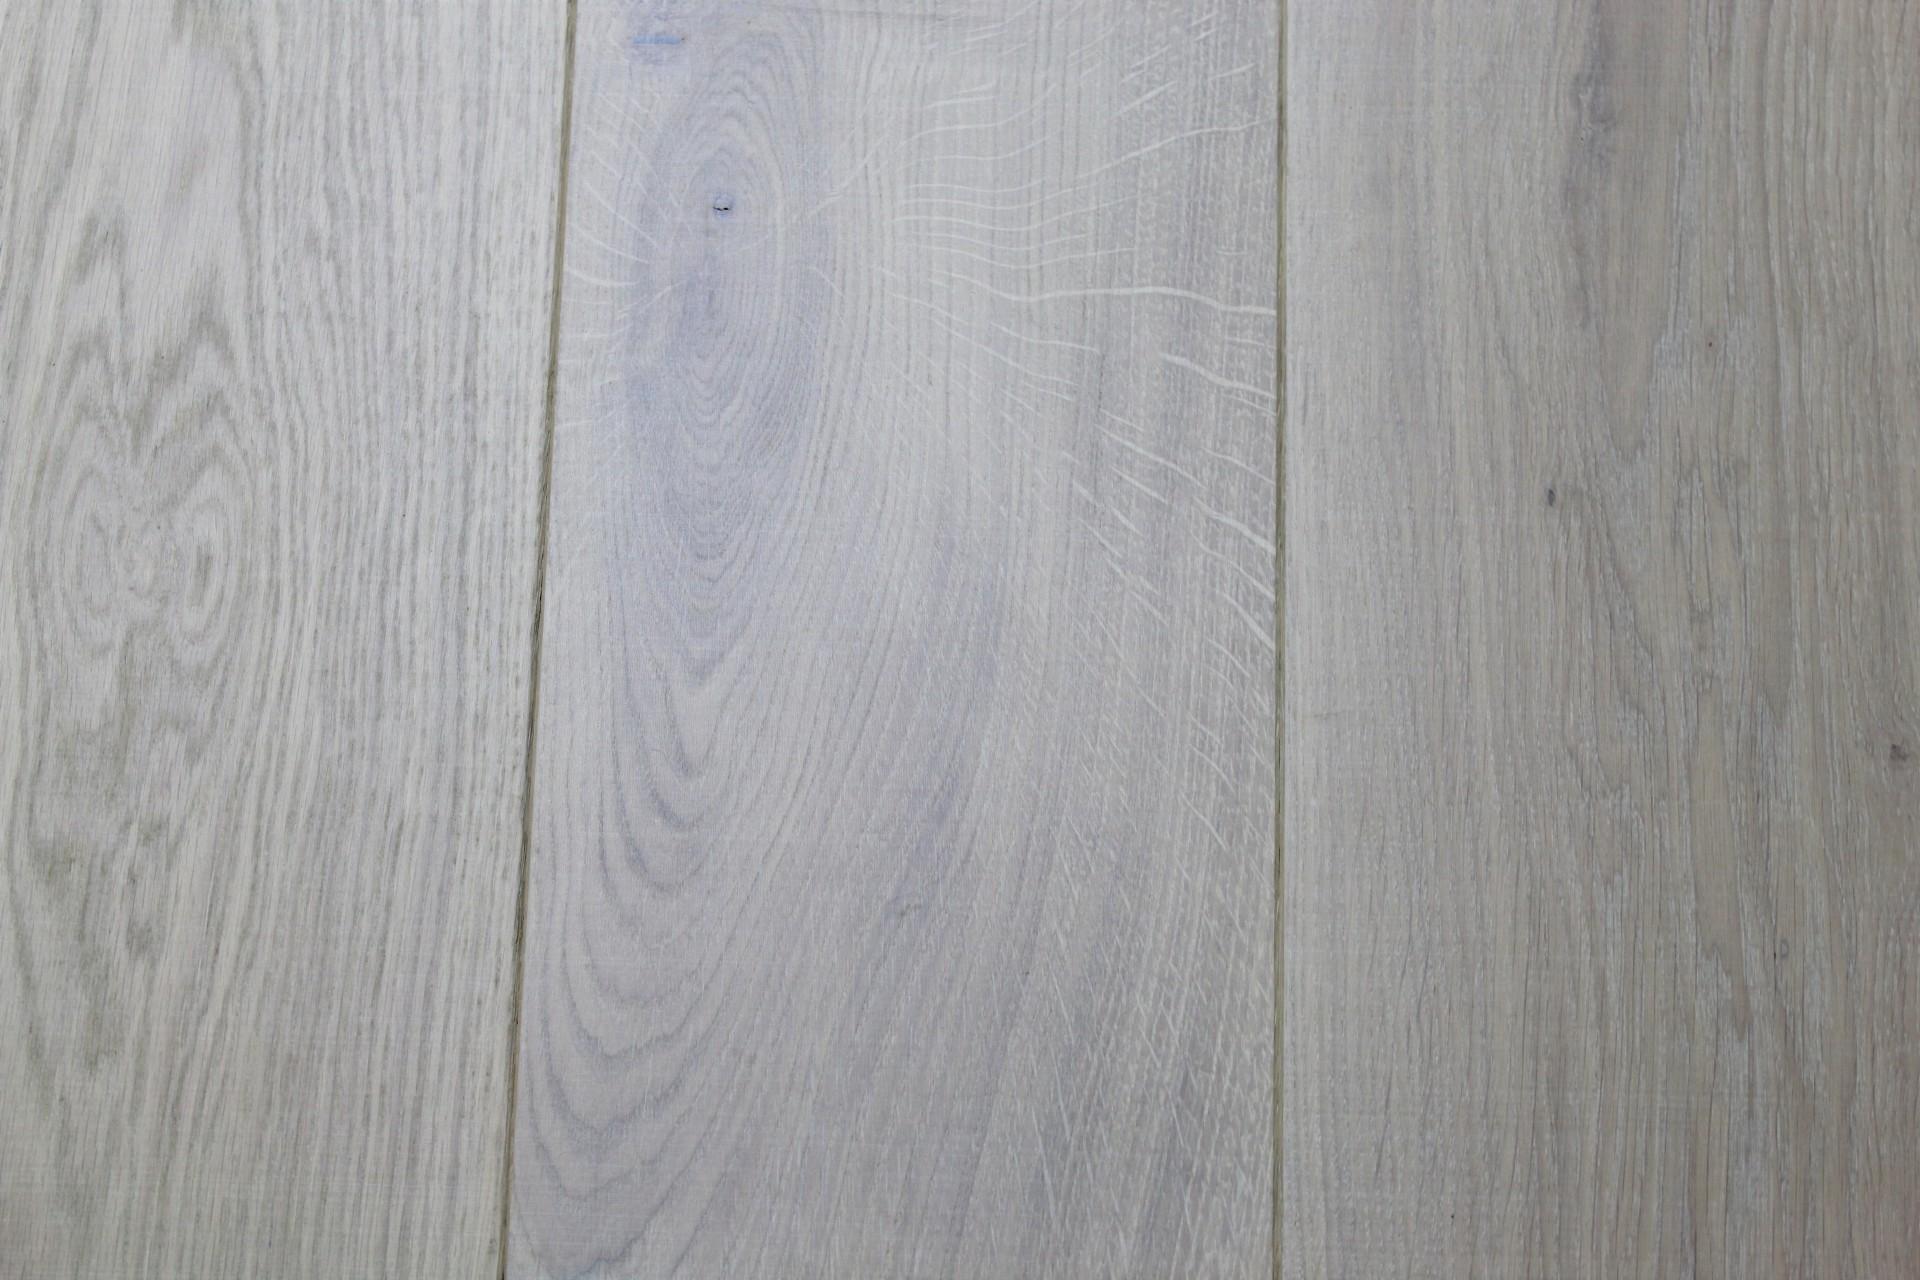 Hardwood, prefinished floor, engineered wood, solid wood, lifestyle, hard surface, prefinished hardwood, prefinished wood, home, design, interior design, wood floor design, legno bastone